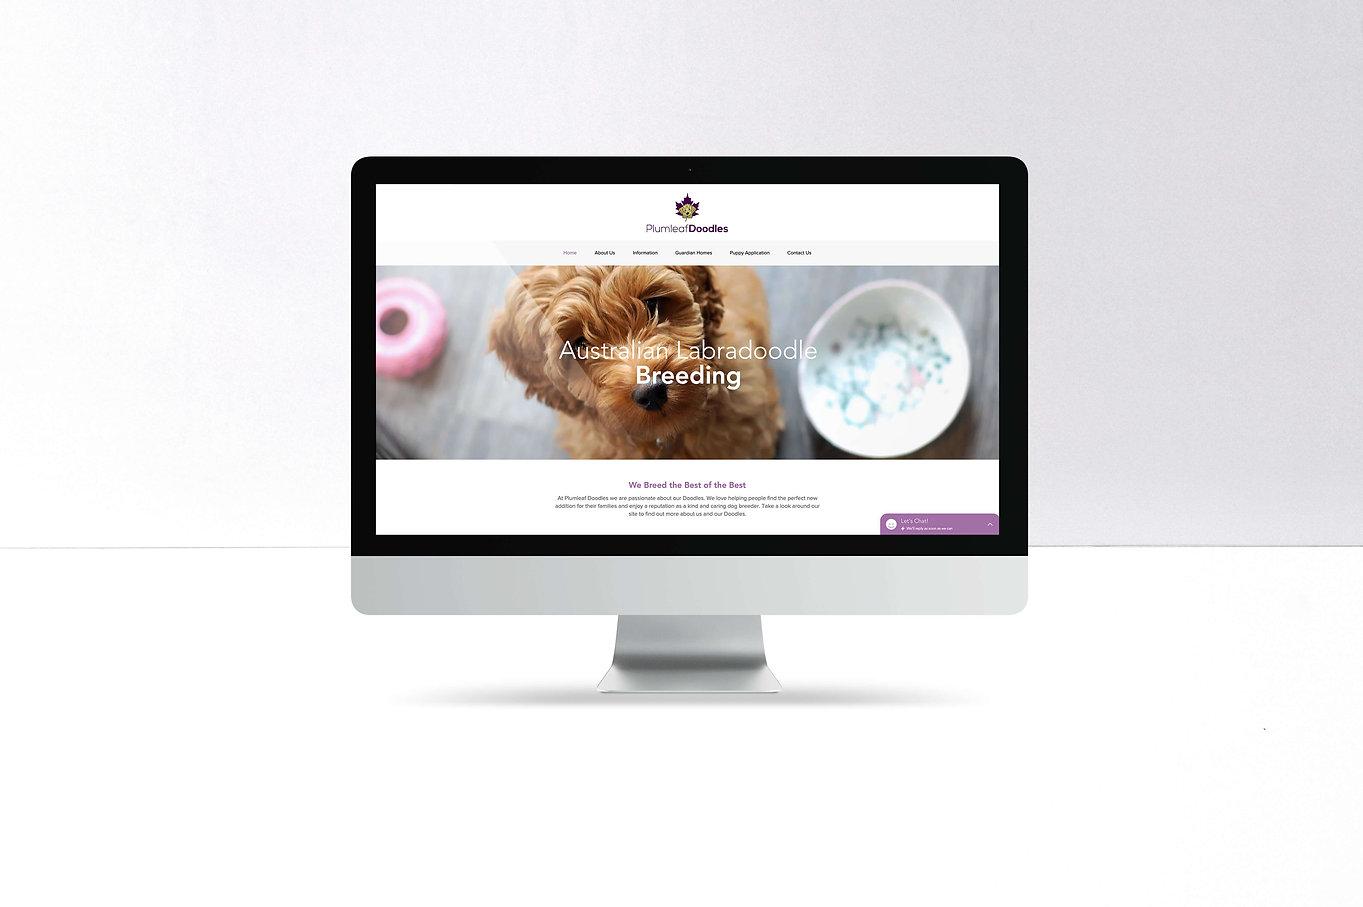 DLC-PlumleafDoodles-Website1.jpg